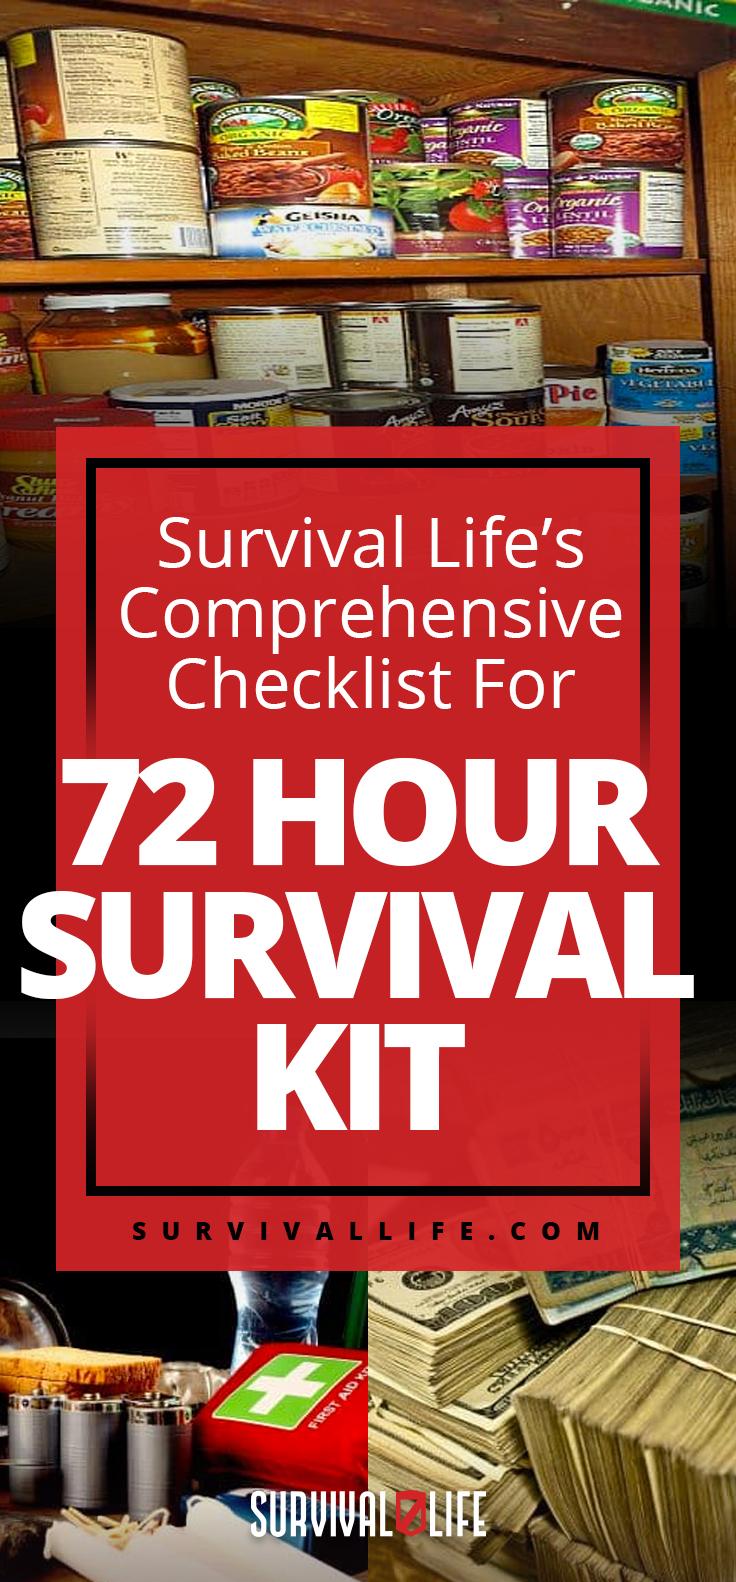 Survival Life's Comprehensive Checklist For 72 Hour Survival Kit   Bug-Out Kit